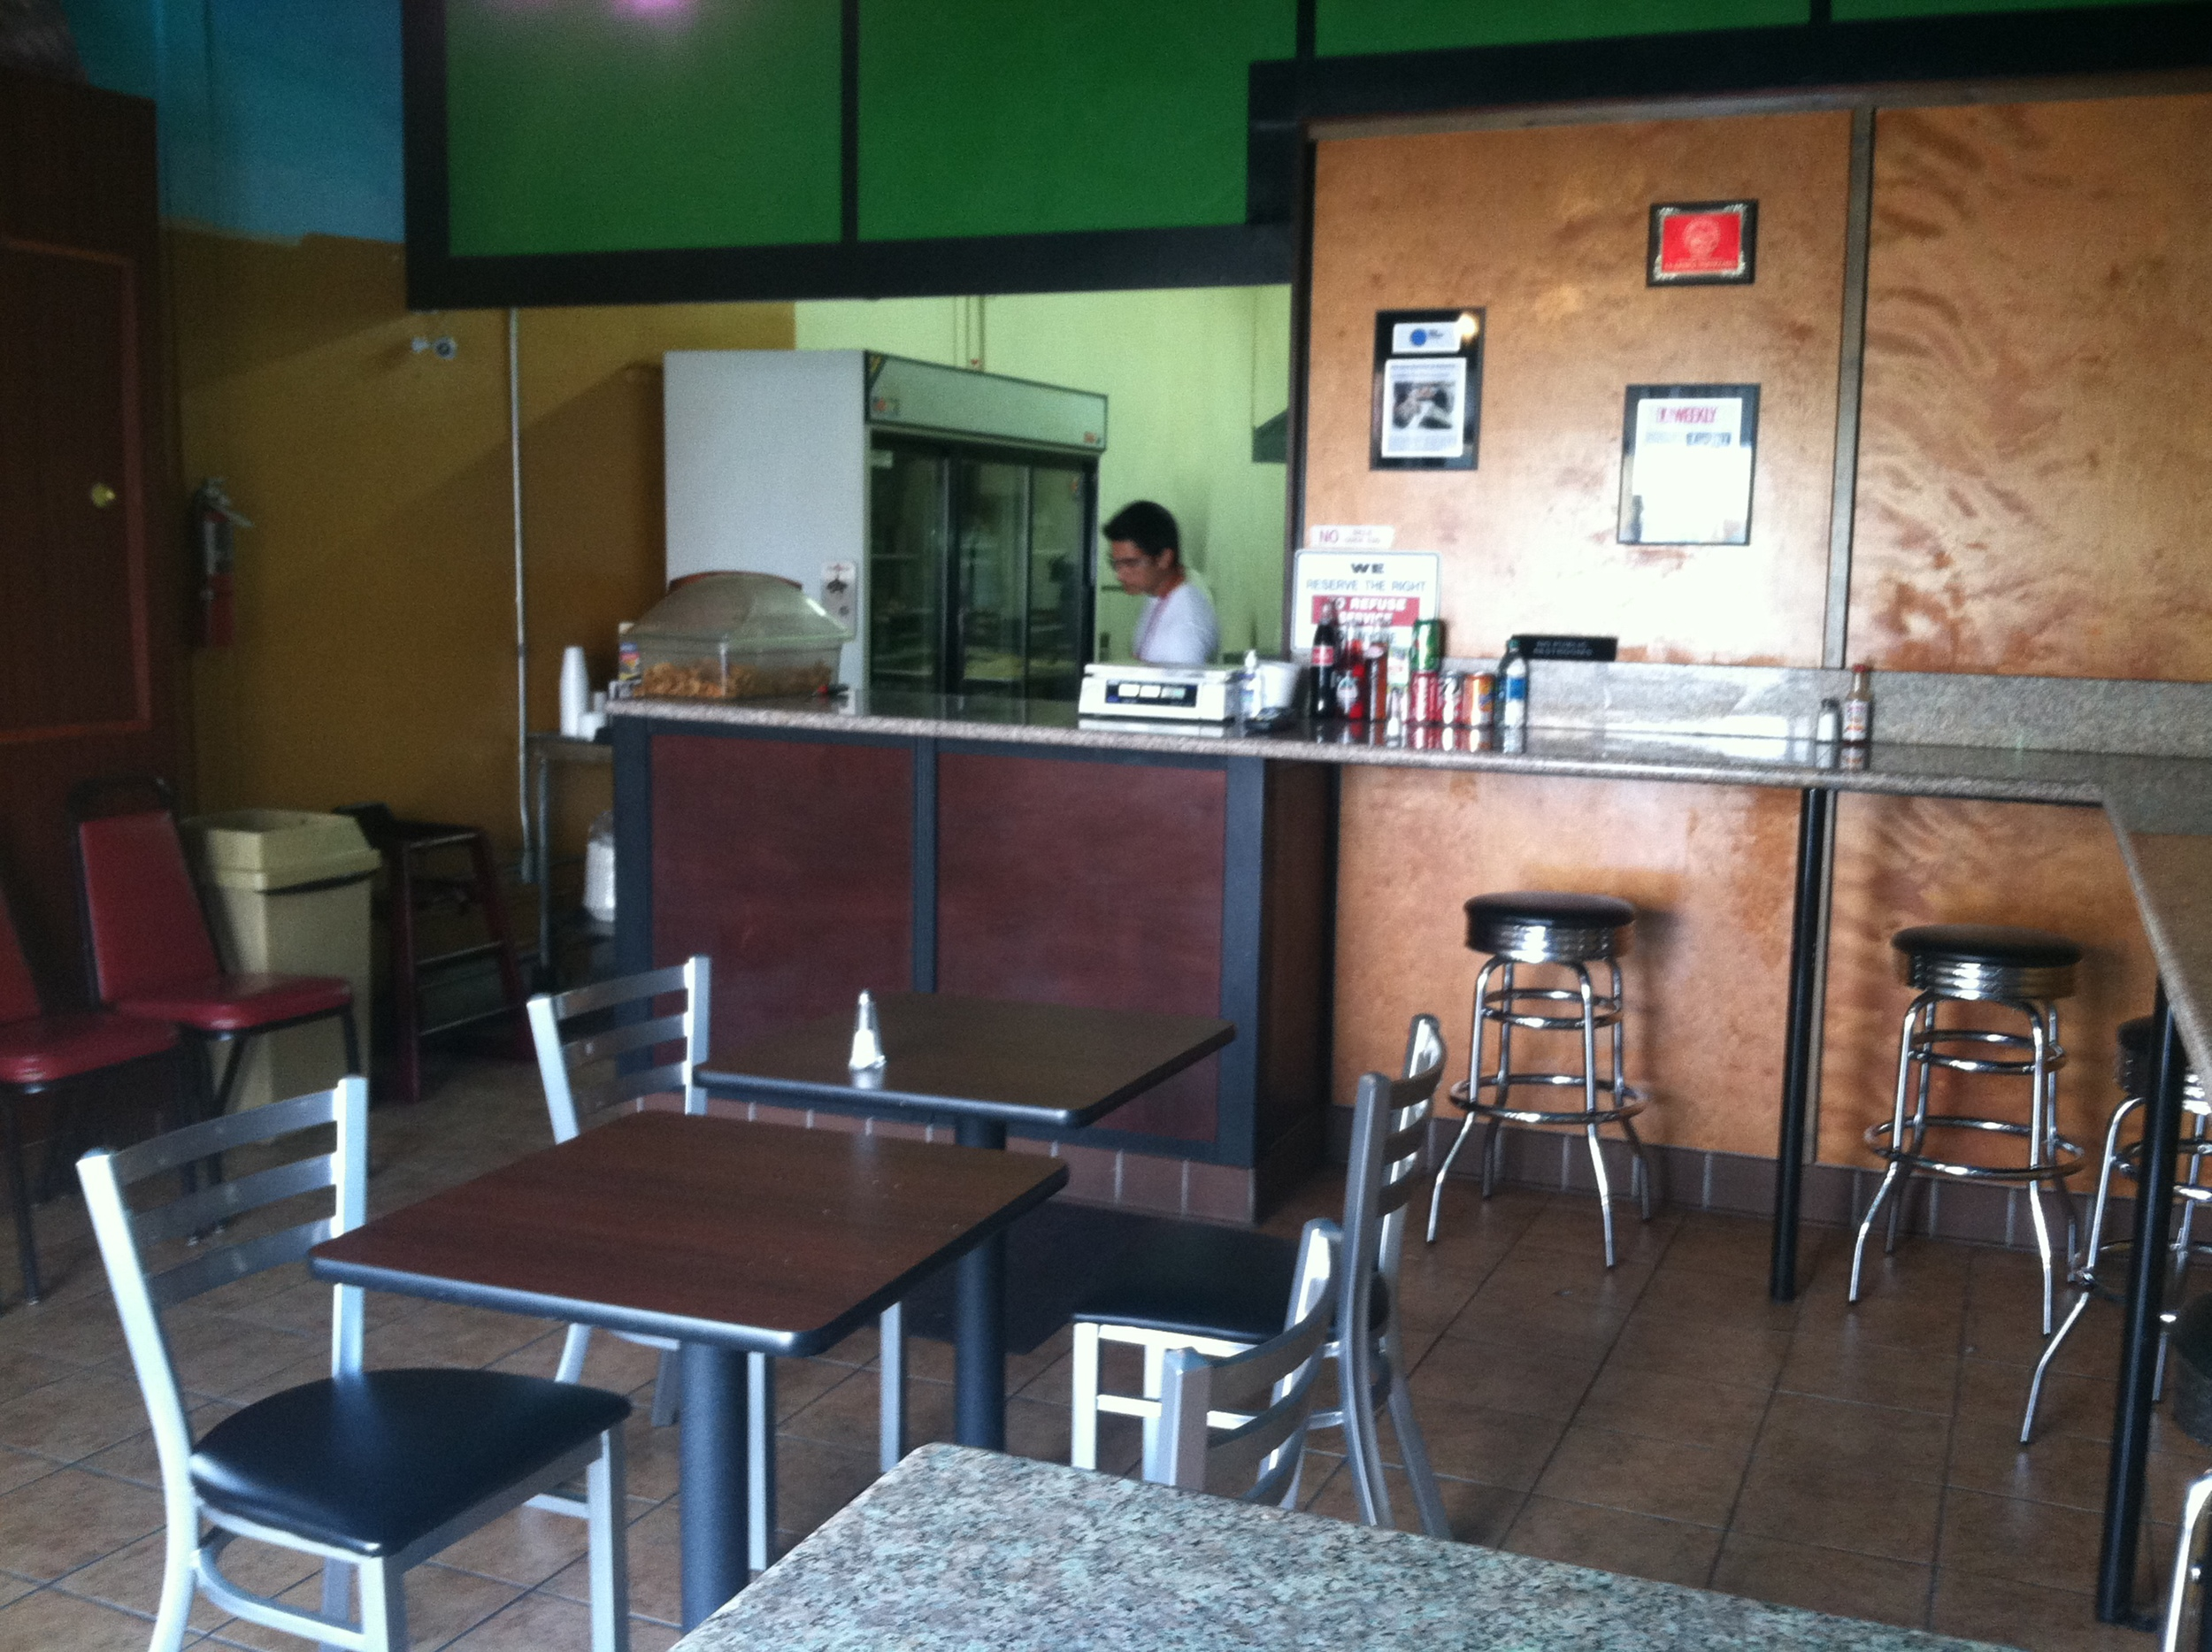 Main dining room of La Azteca,